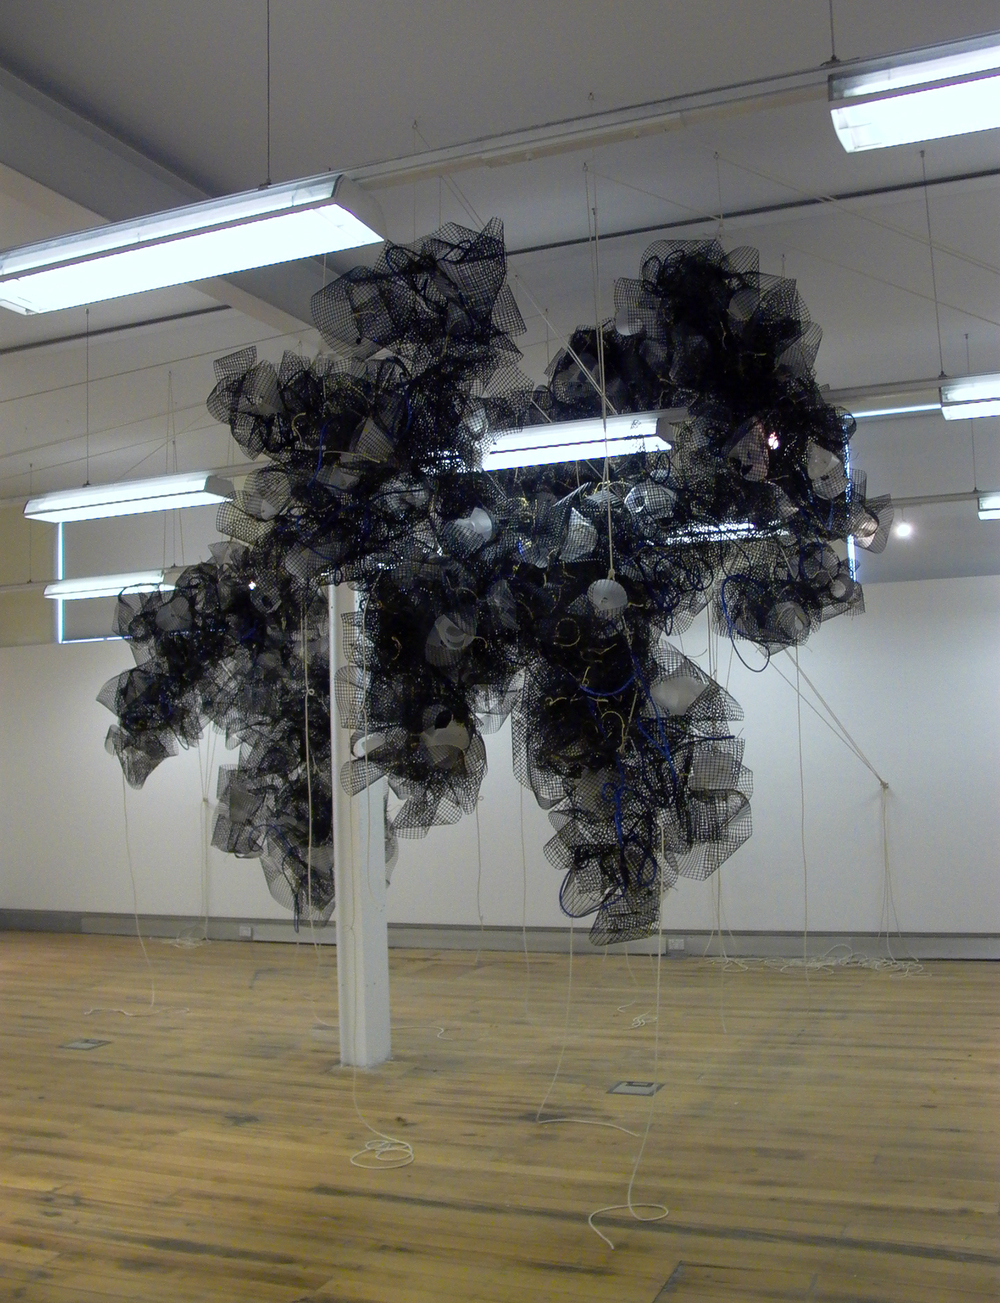 Lure I,  2009. Monash, Melbourne.  Plastic trellis, fibreglass, polypropylene, rope, light. Dimensions variable.